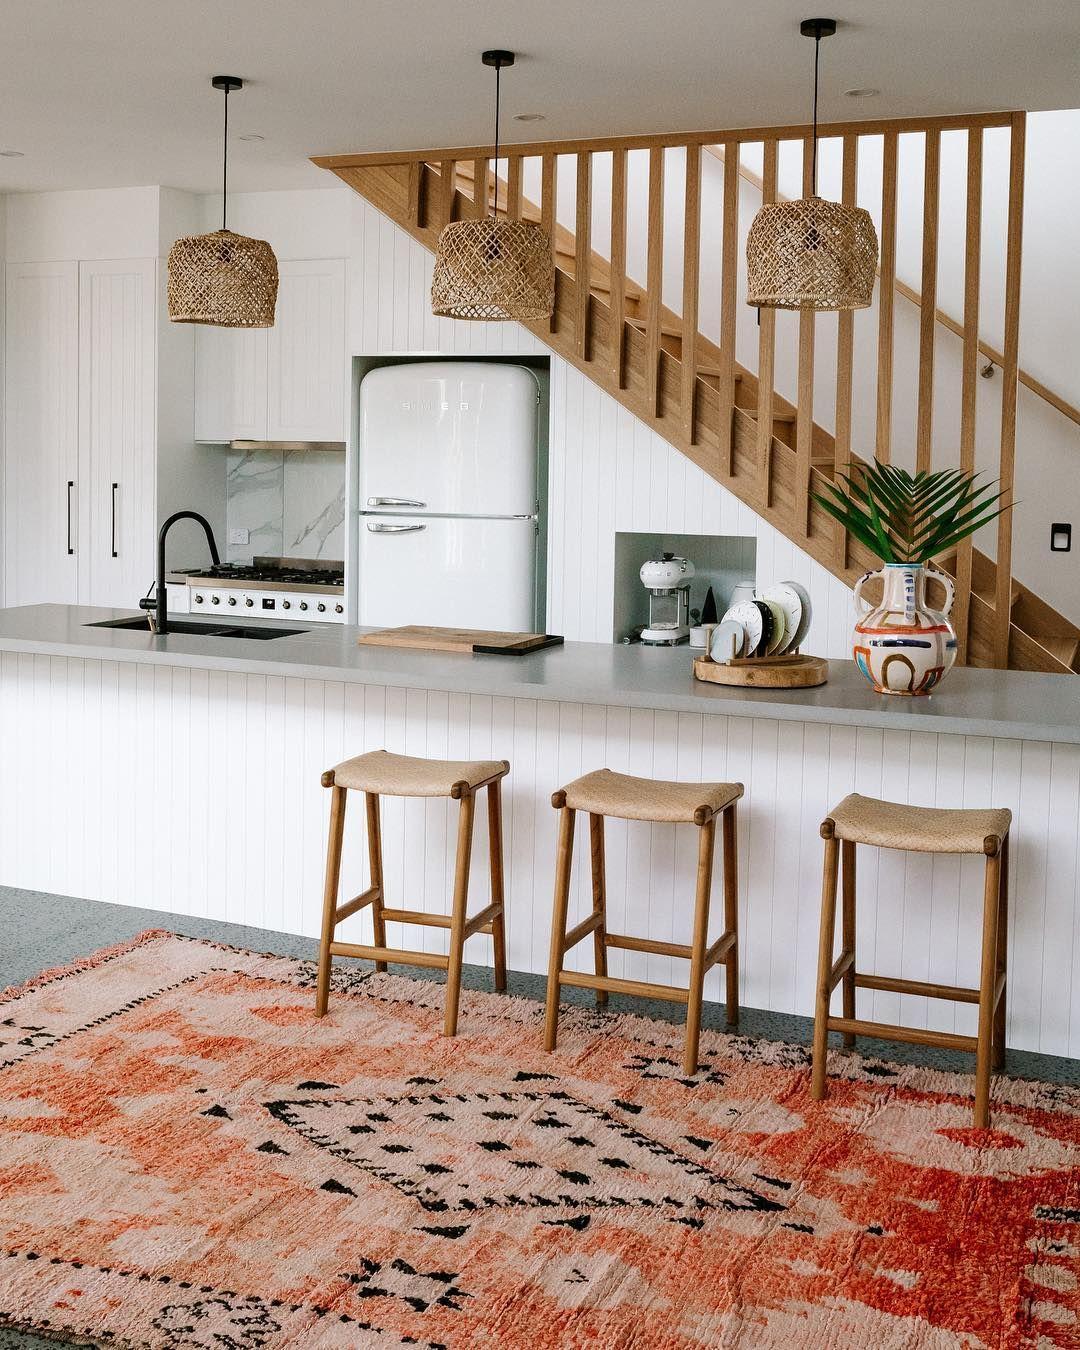 Full Size of Blush Ochre On Instagram A Real Bohemian Beauty Küchen Regal Wohnzimmer Real Küchen